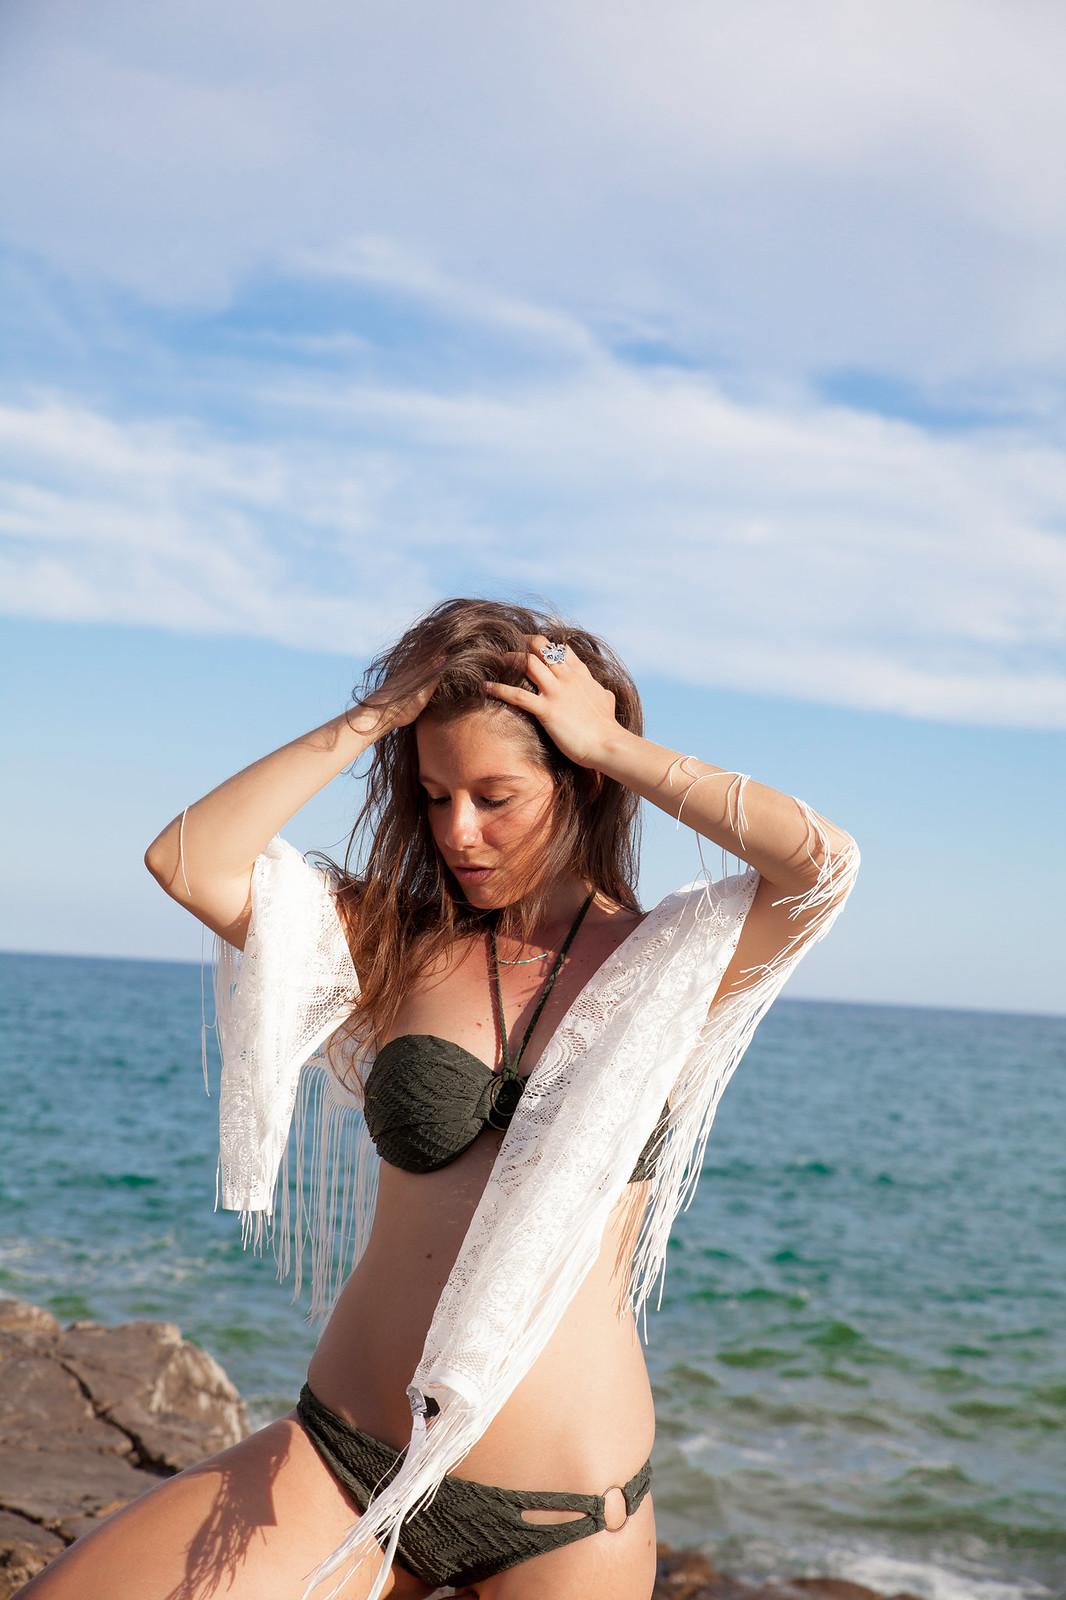 03_Hunker_Moller_Bikini_Comodo_embarazada_theguestgirl_laura_santolaria_influencer_moda_embarazada